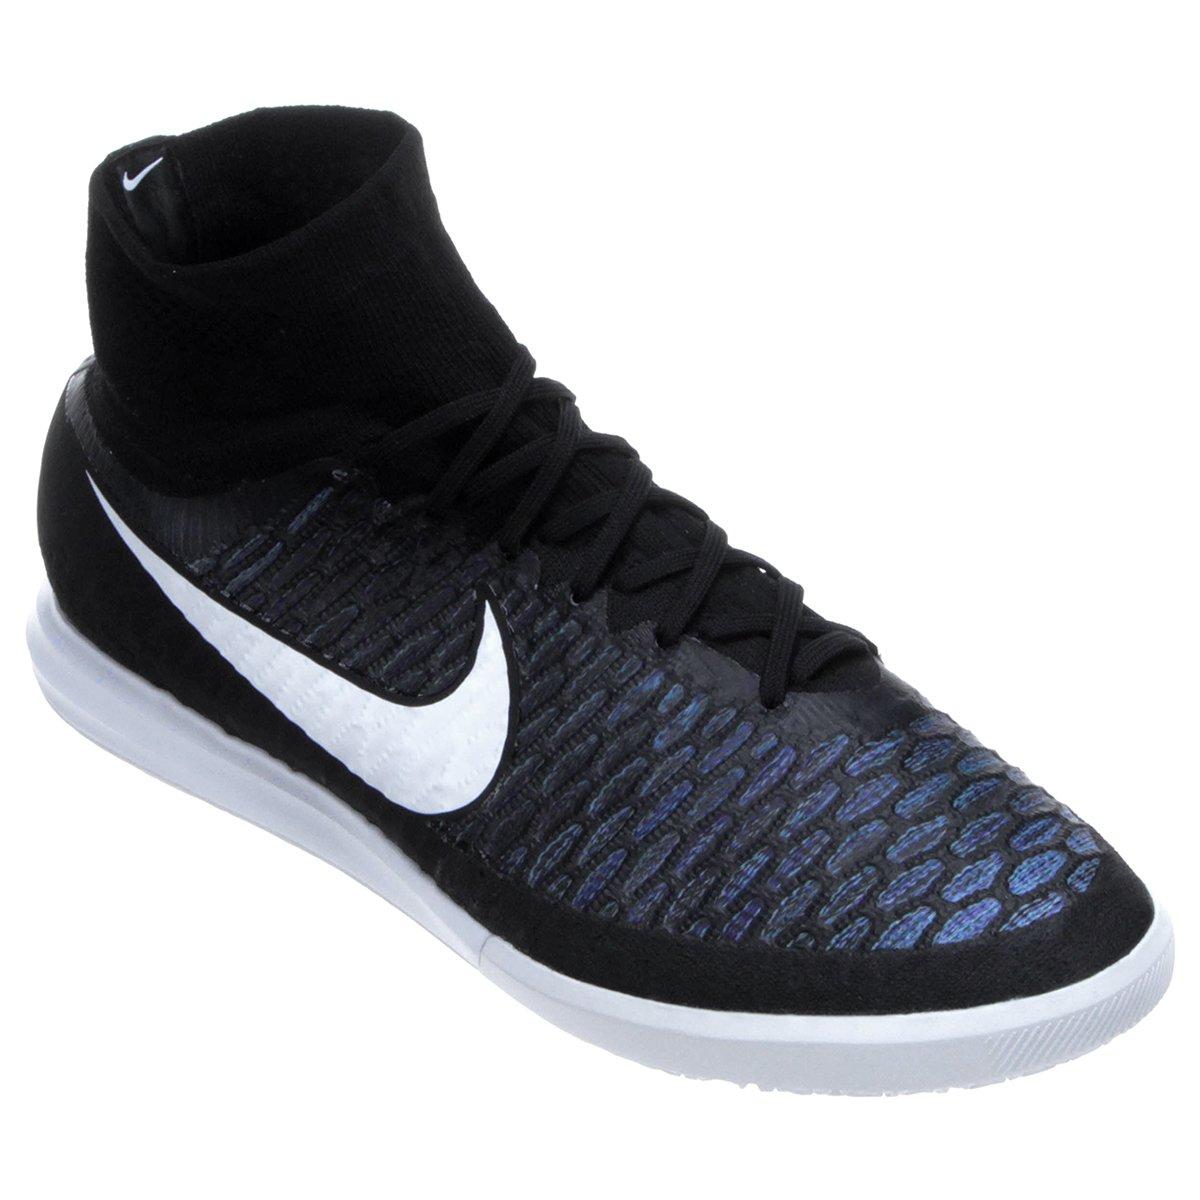 5e4e024f1c Chuteira Nike Magista Próximo Street IC Futsal - Compre Agora